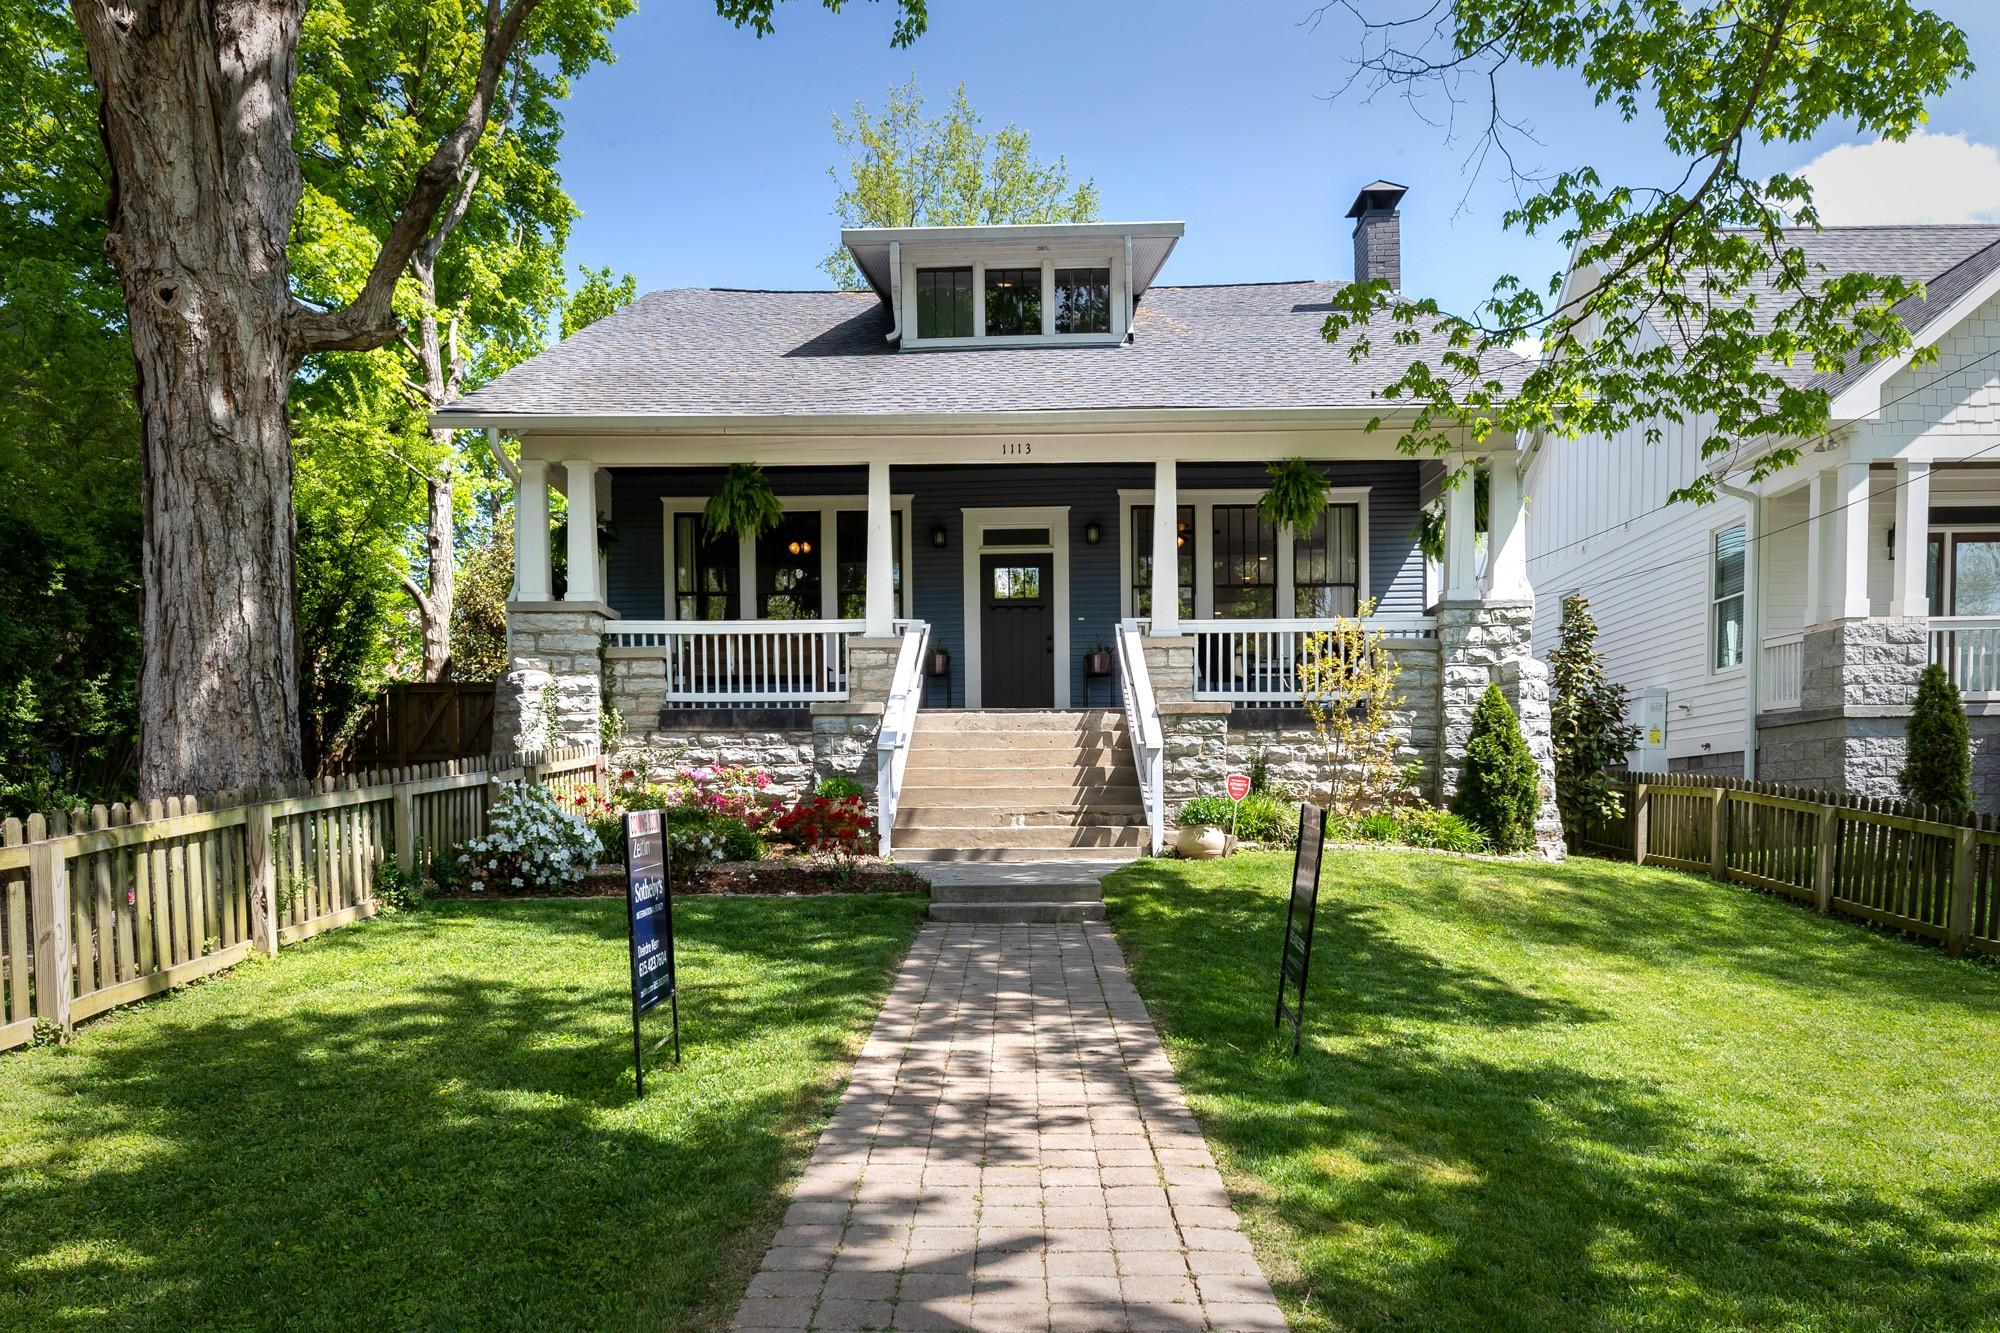 1113 Greenwood Ave Property Photo - Nashville, TN real estate listing